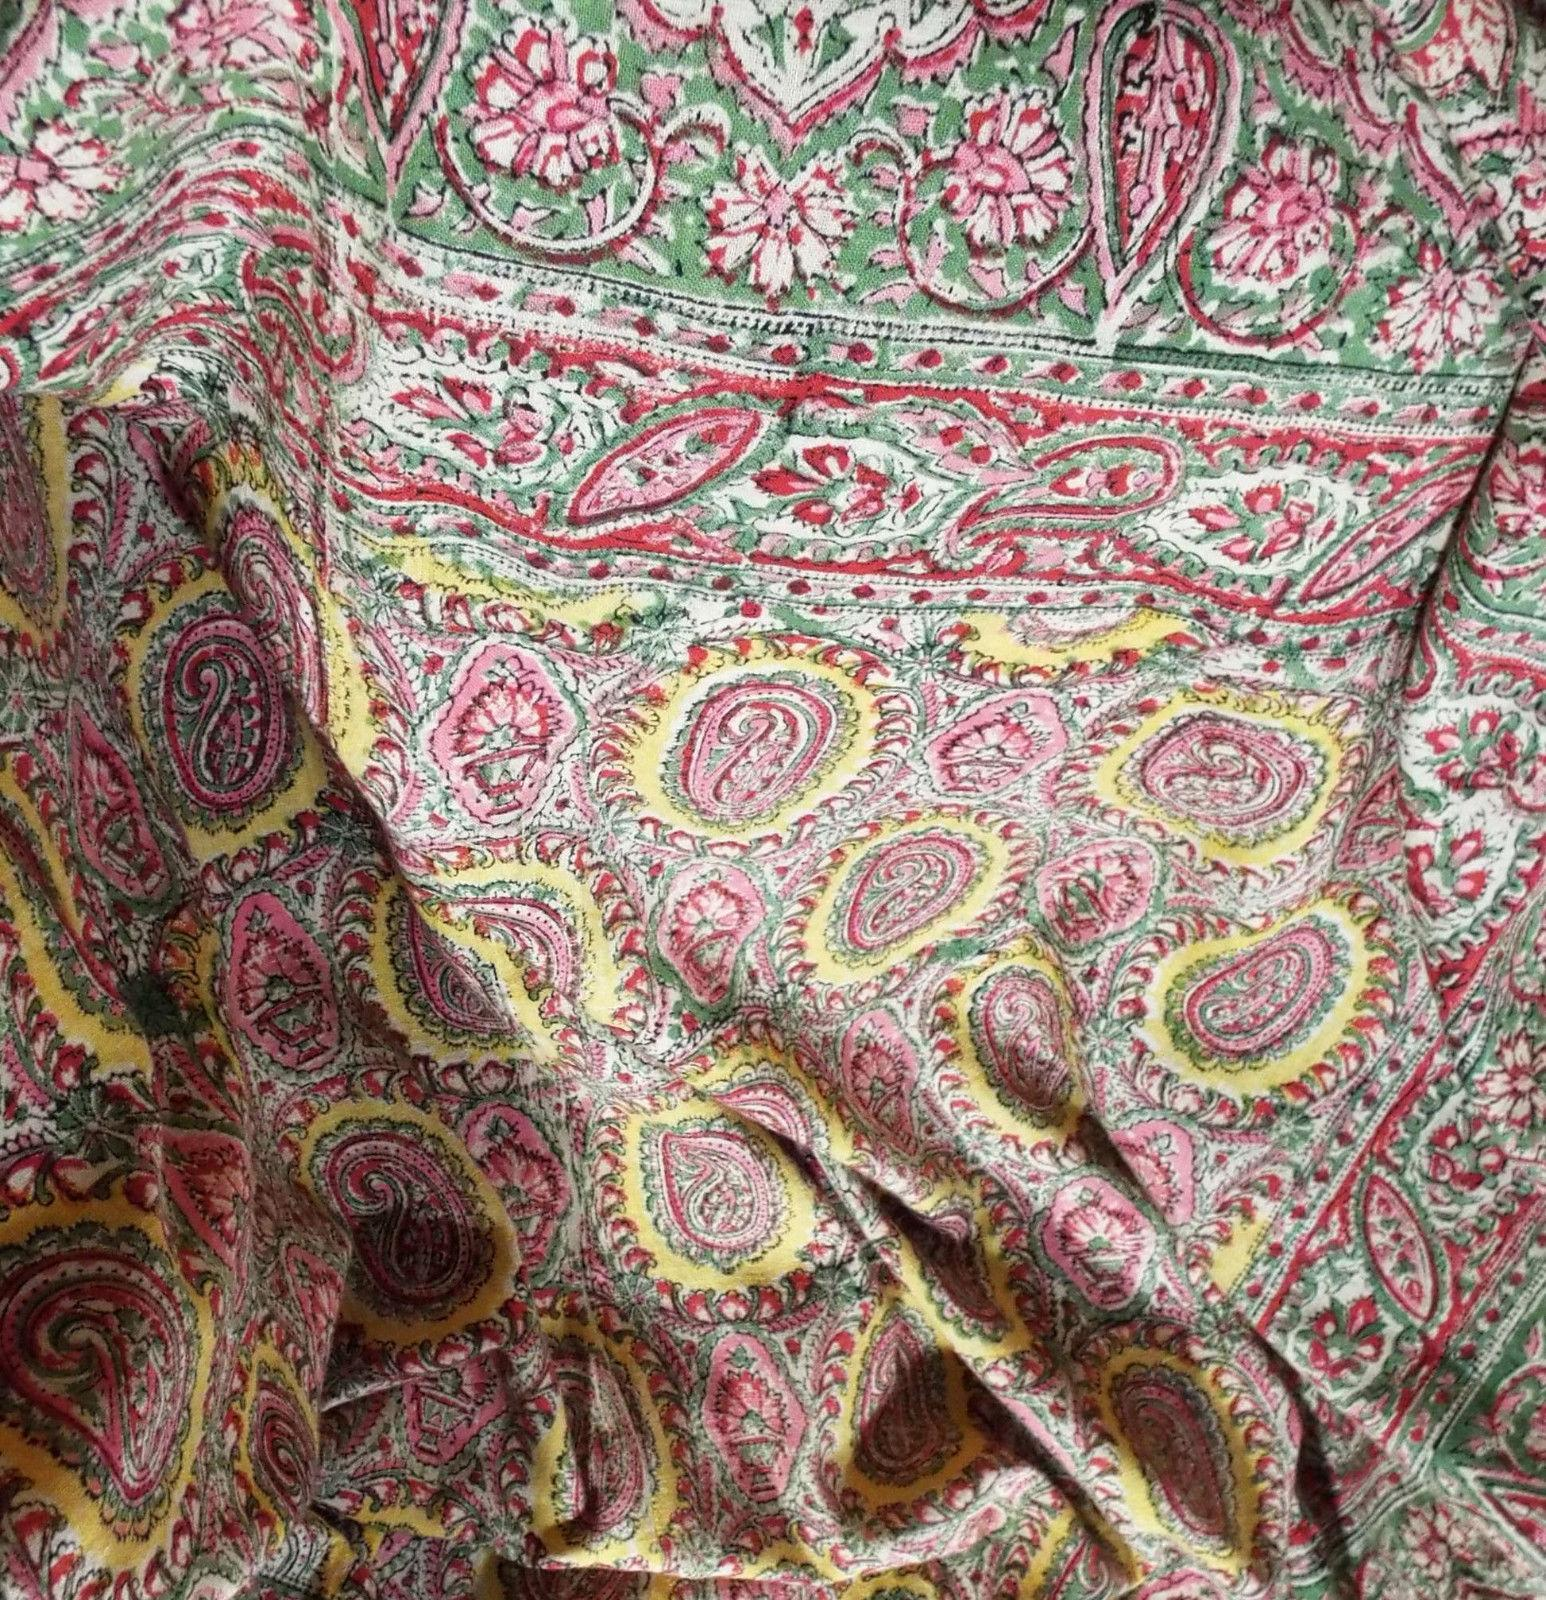 Circa 1900 Fine Kalamkari Hand Printed Cotton Cover Indienne Palampore Design